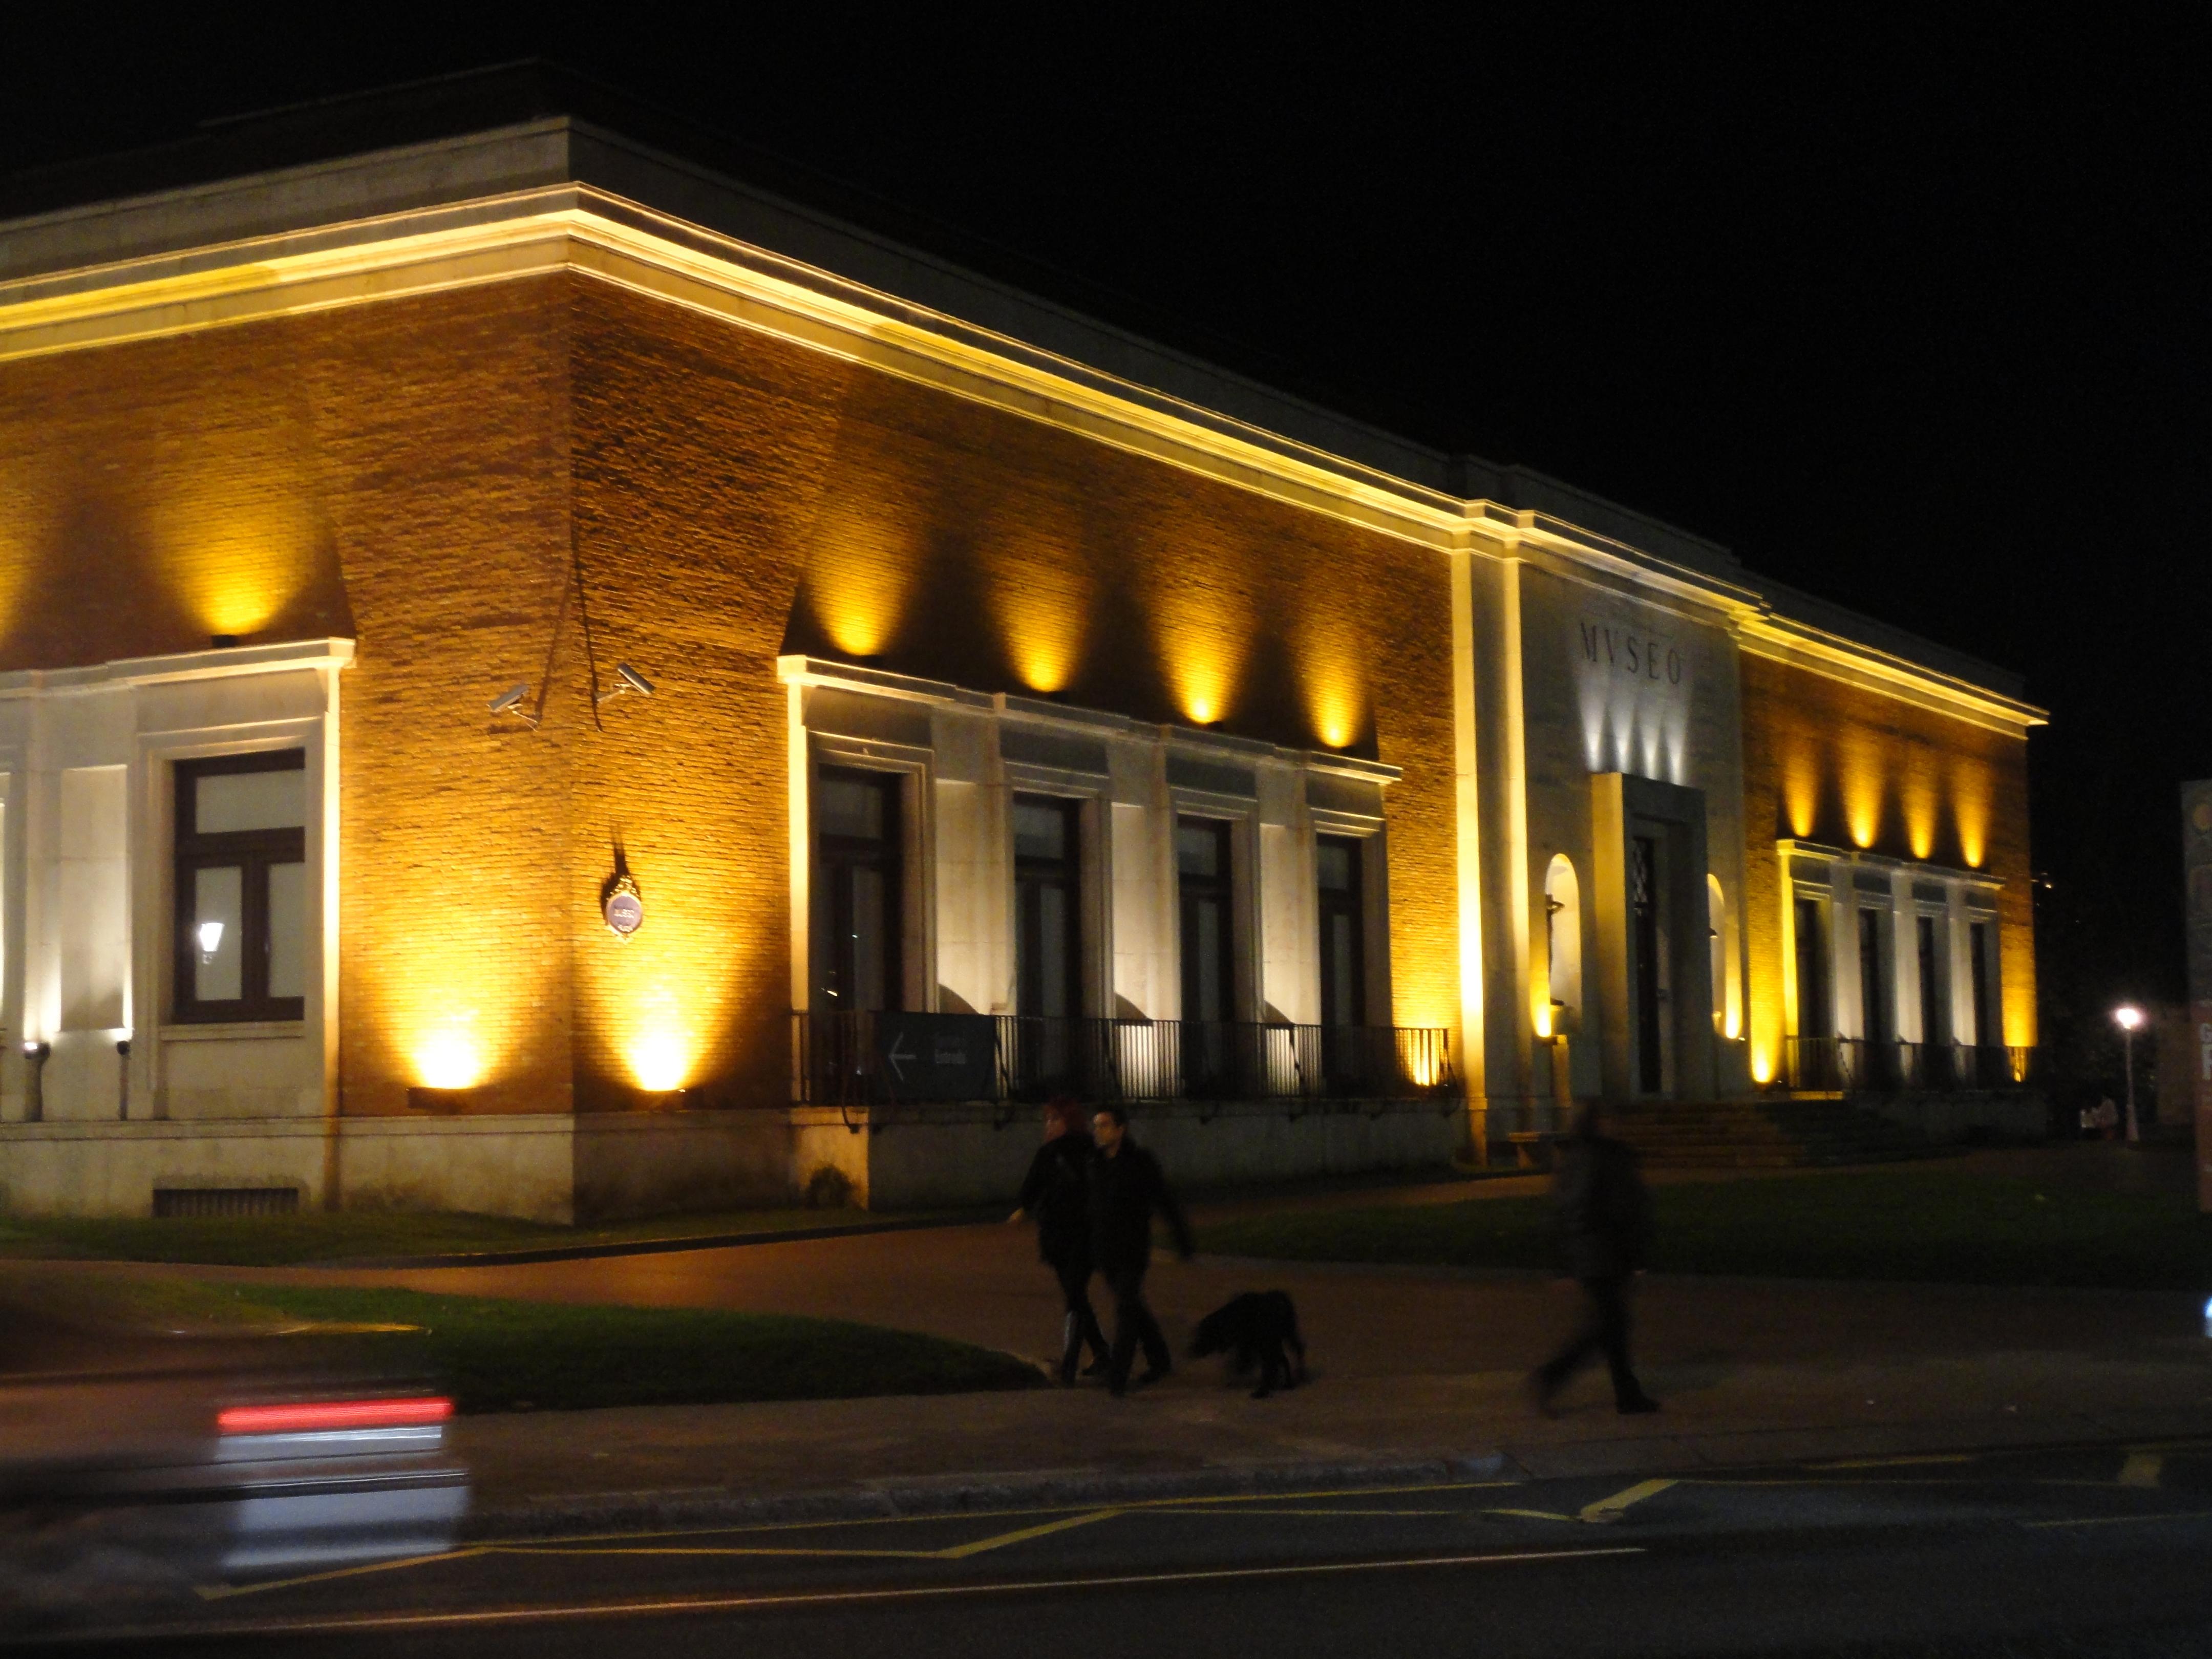 File:Museo de Bellas Artes-Bilbao.jpg - Wikimedia Commons